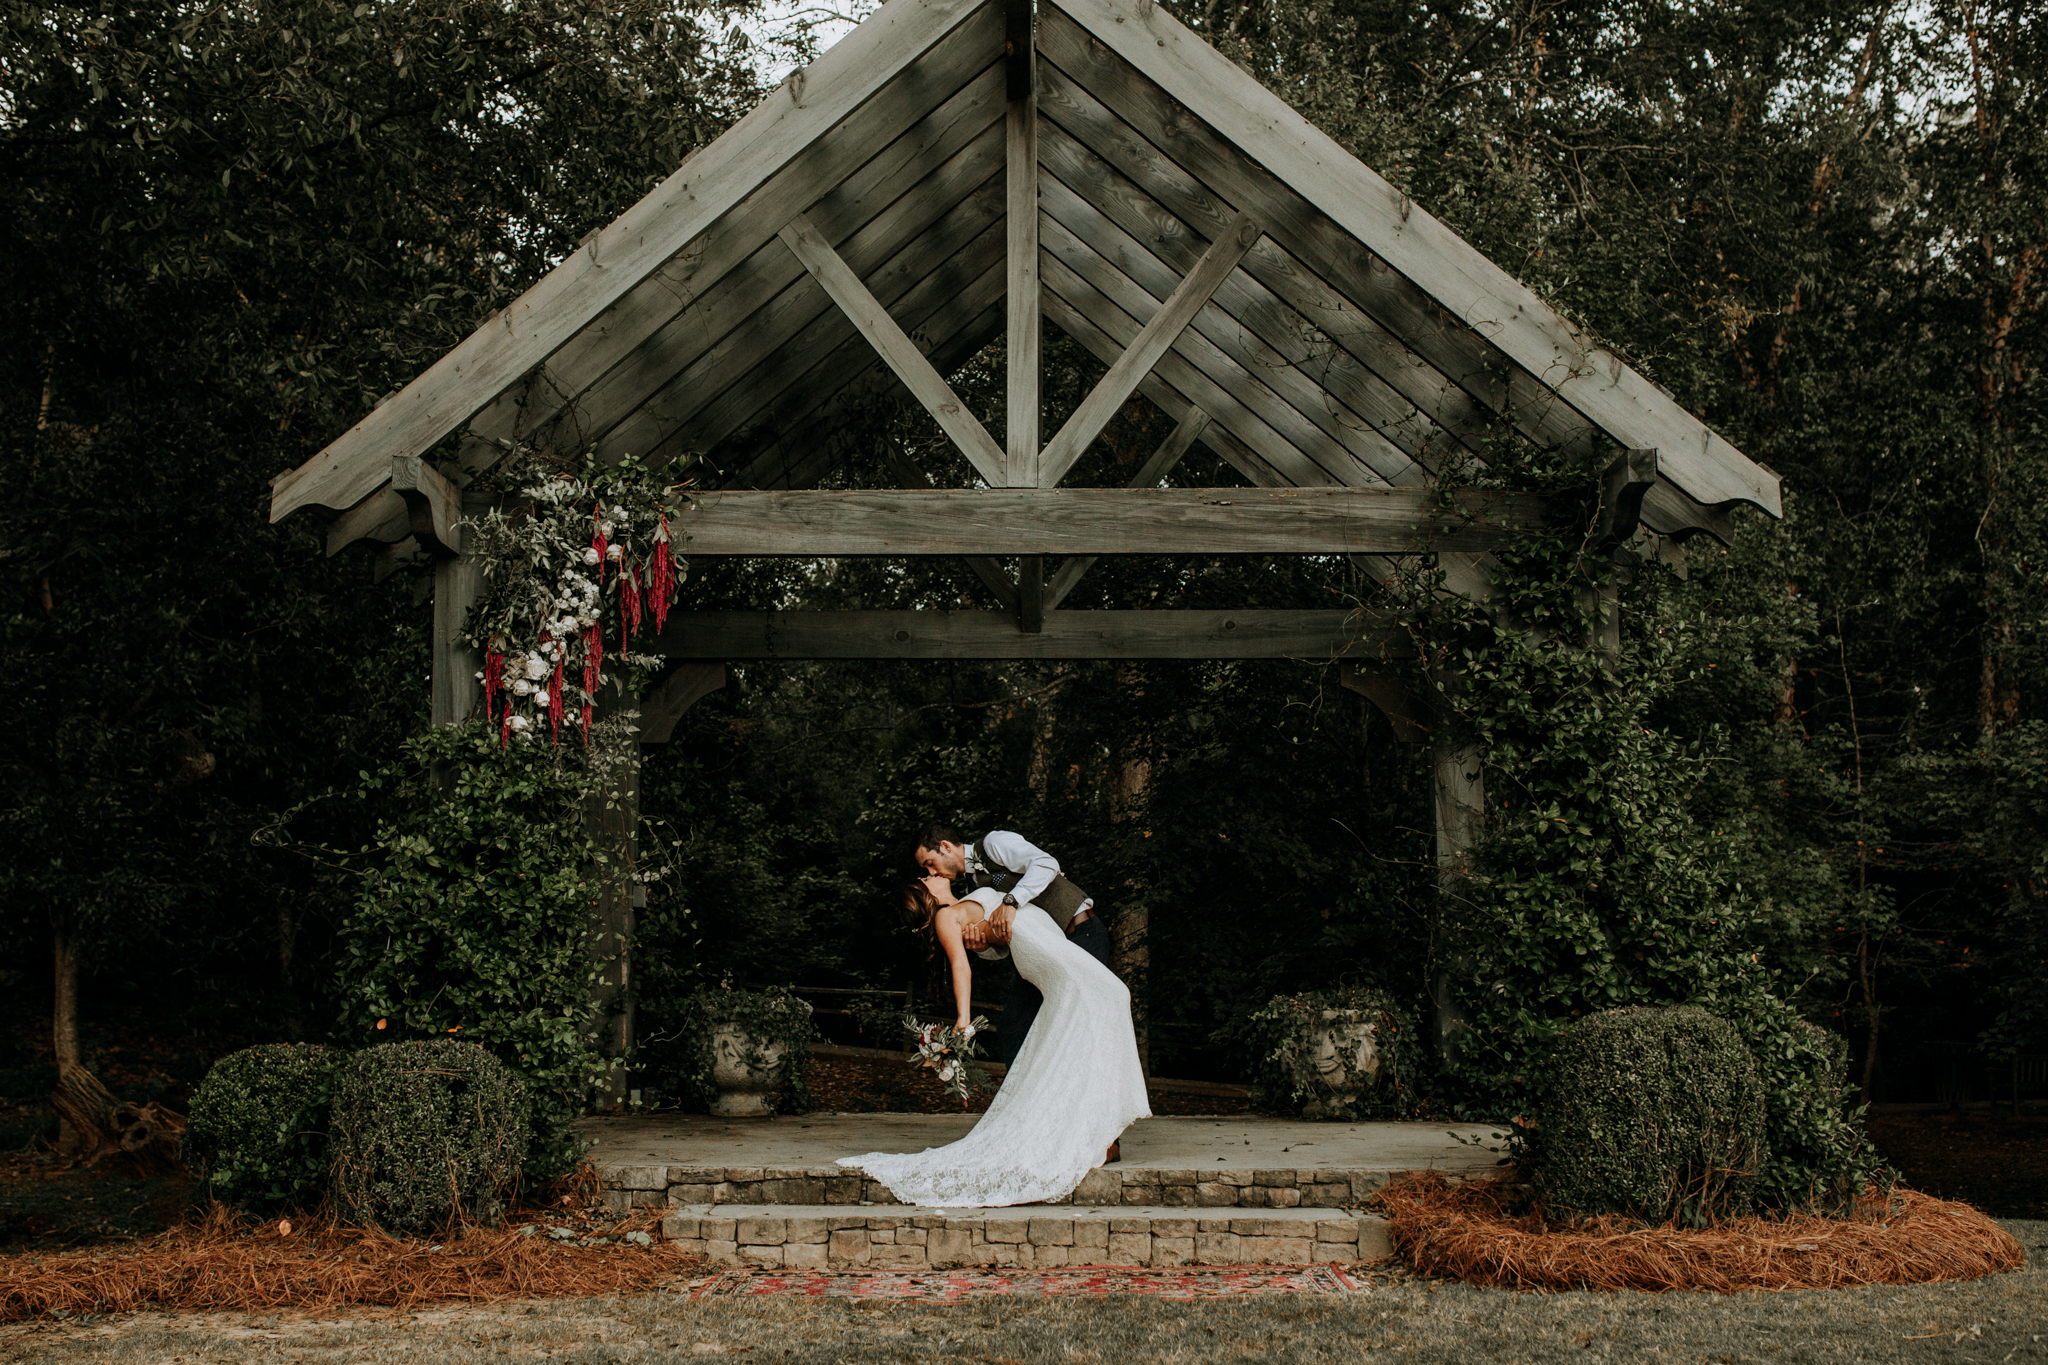 MonicaLeavell-Georgia-Carolina-Intimate-Wedding-Photographer-35-2